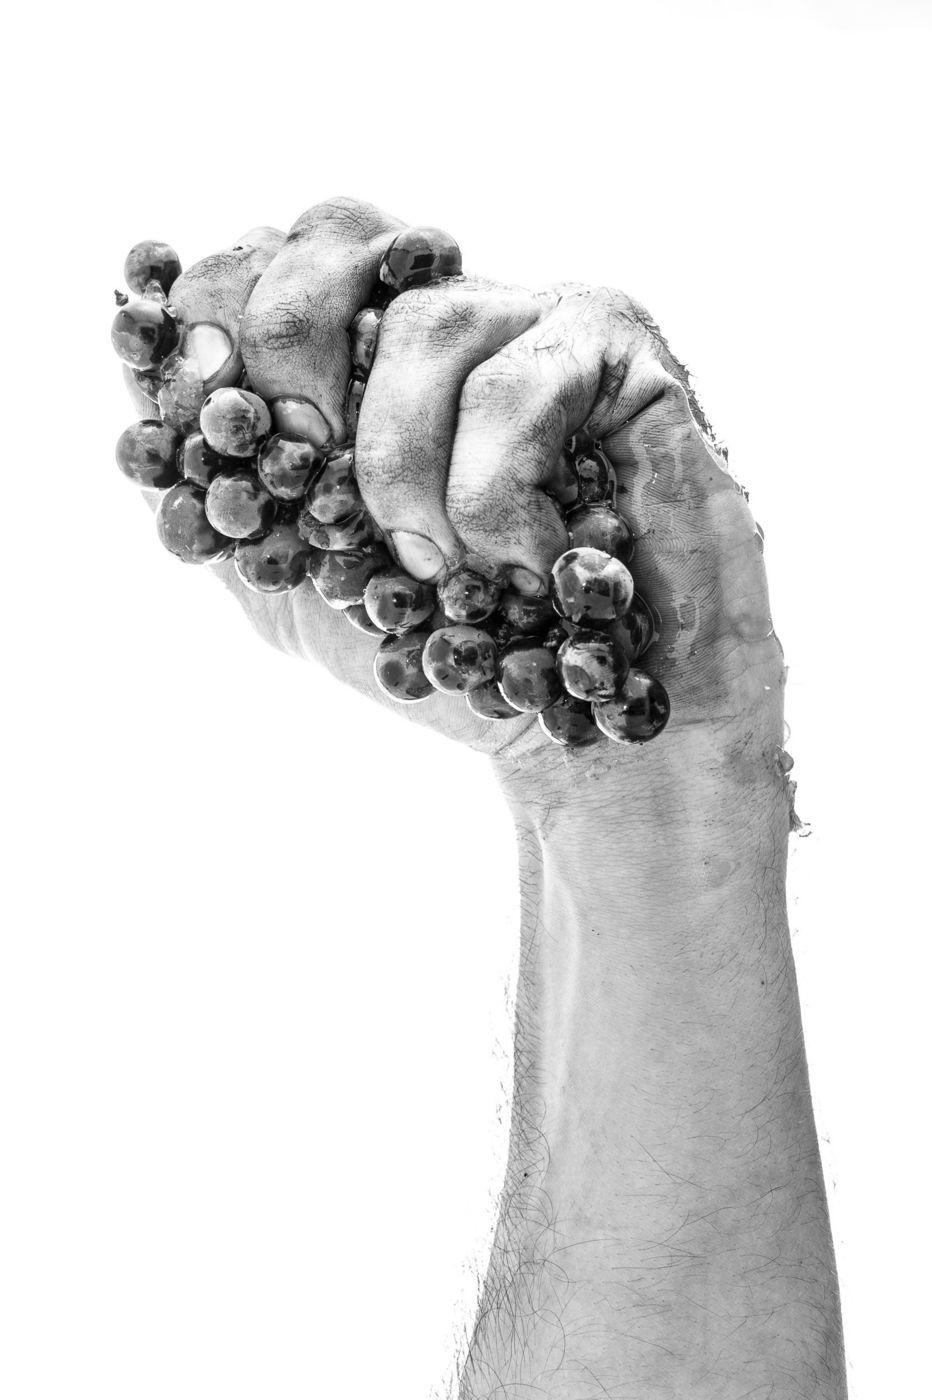 Badens (11) : main de vigneron du Minervois